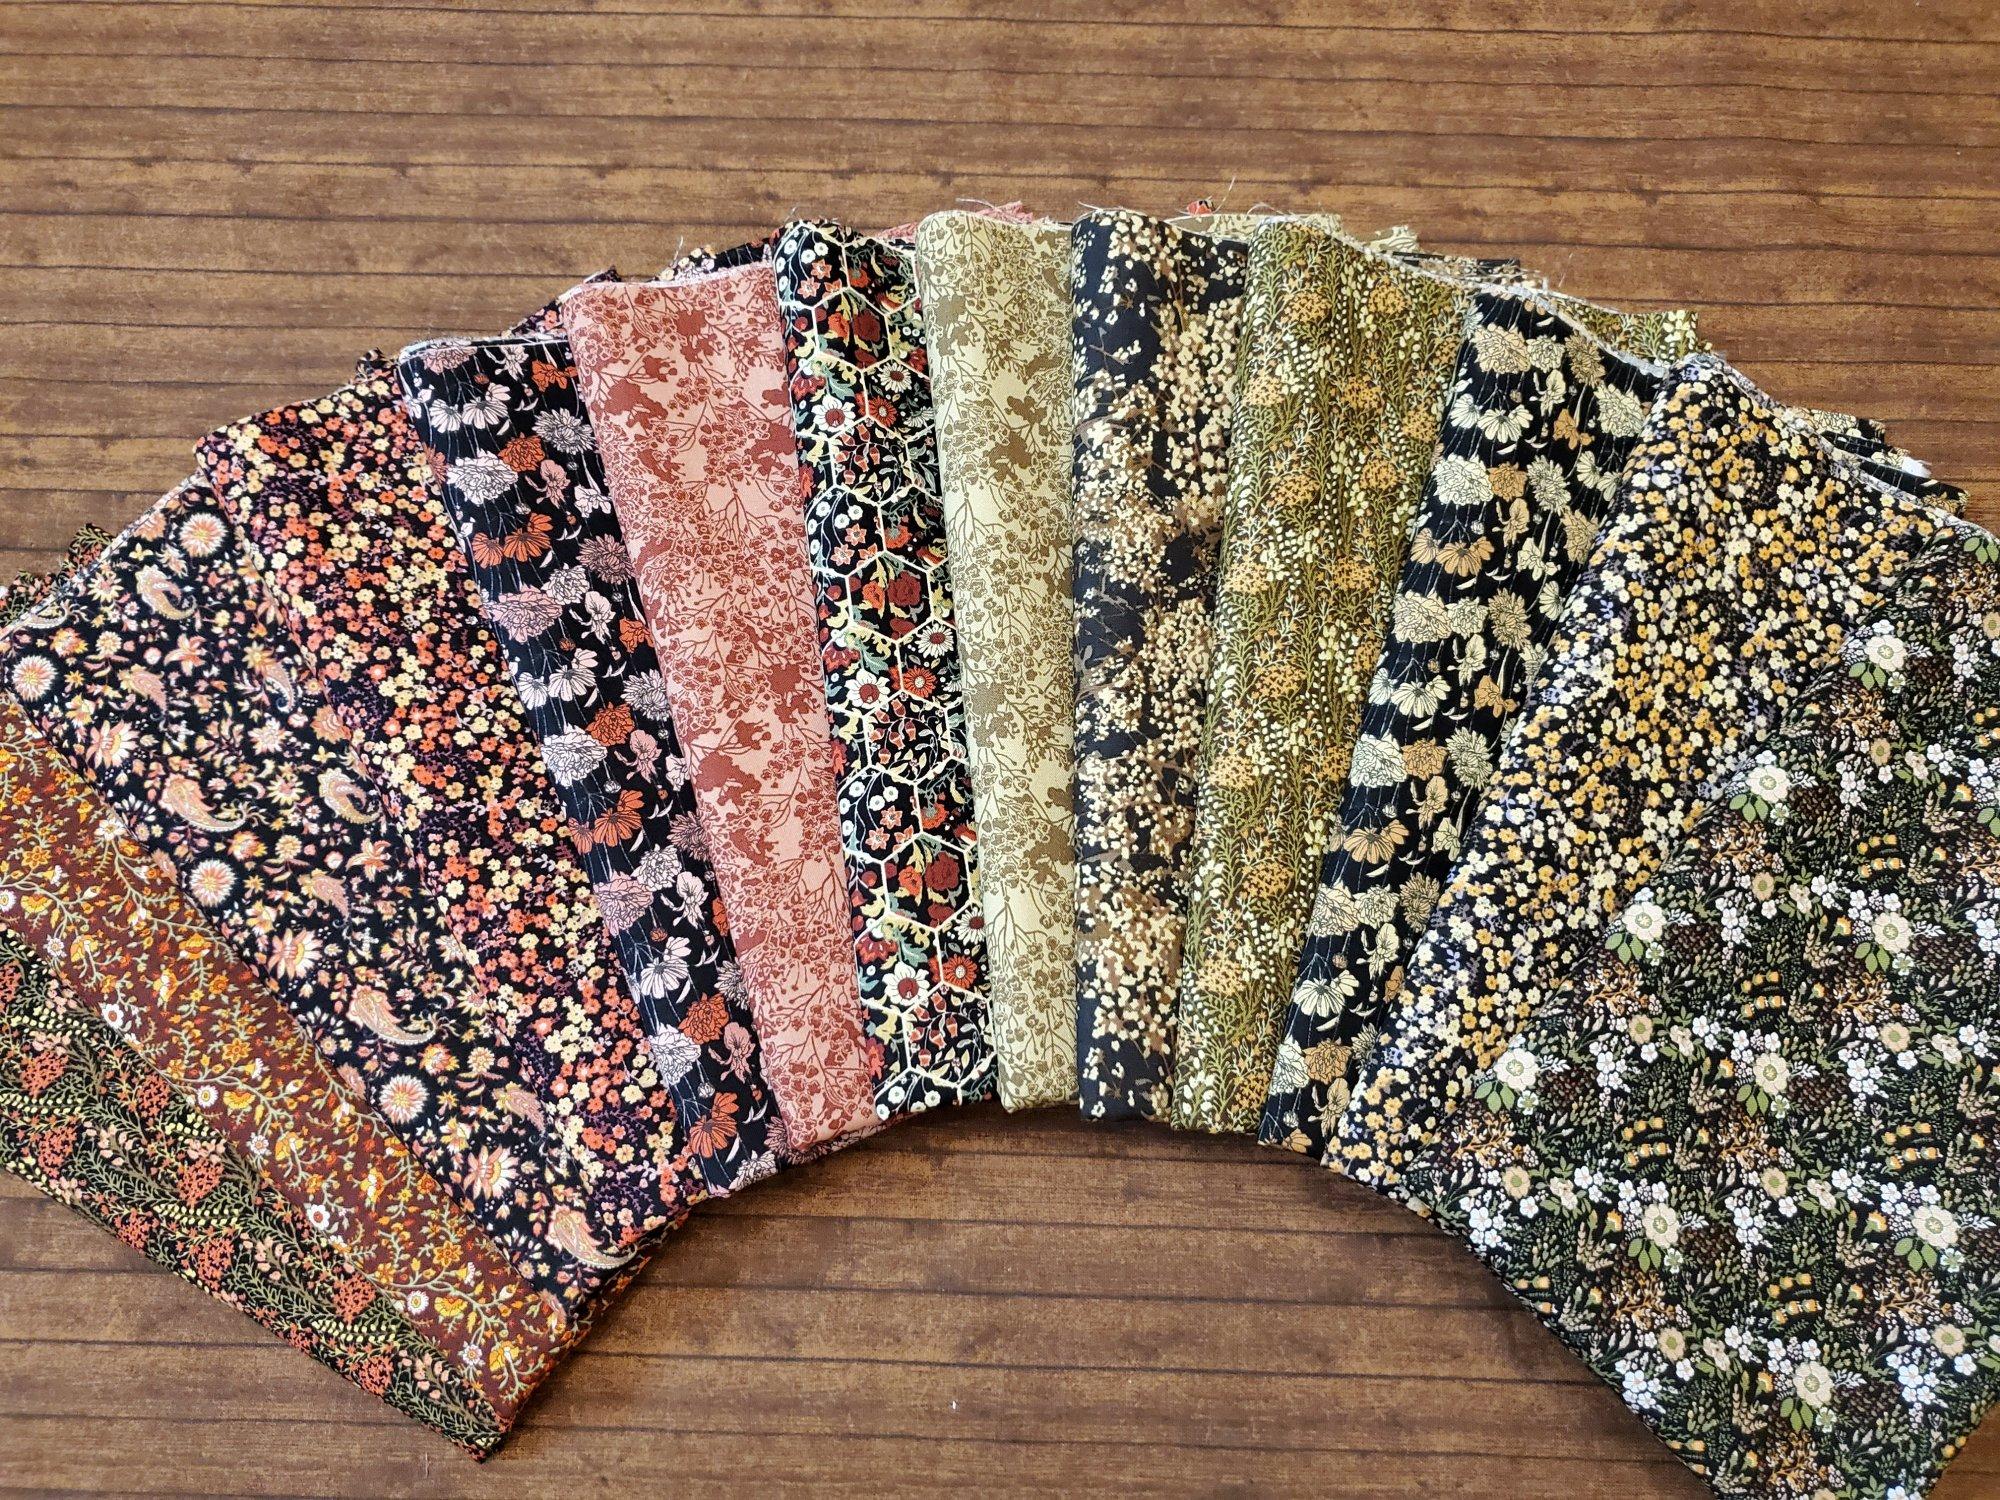 Garden Delights in Warm Colors by Gray Sky Studios for In the Beginning Fabrics - 13 Piece Half Yard Bundle Pack